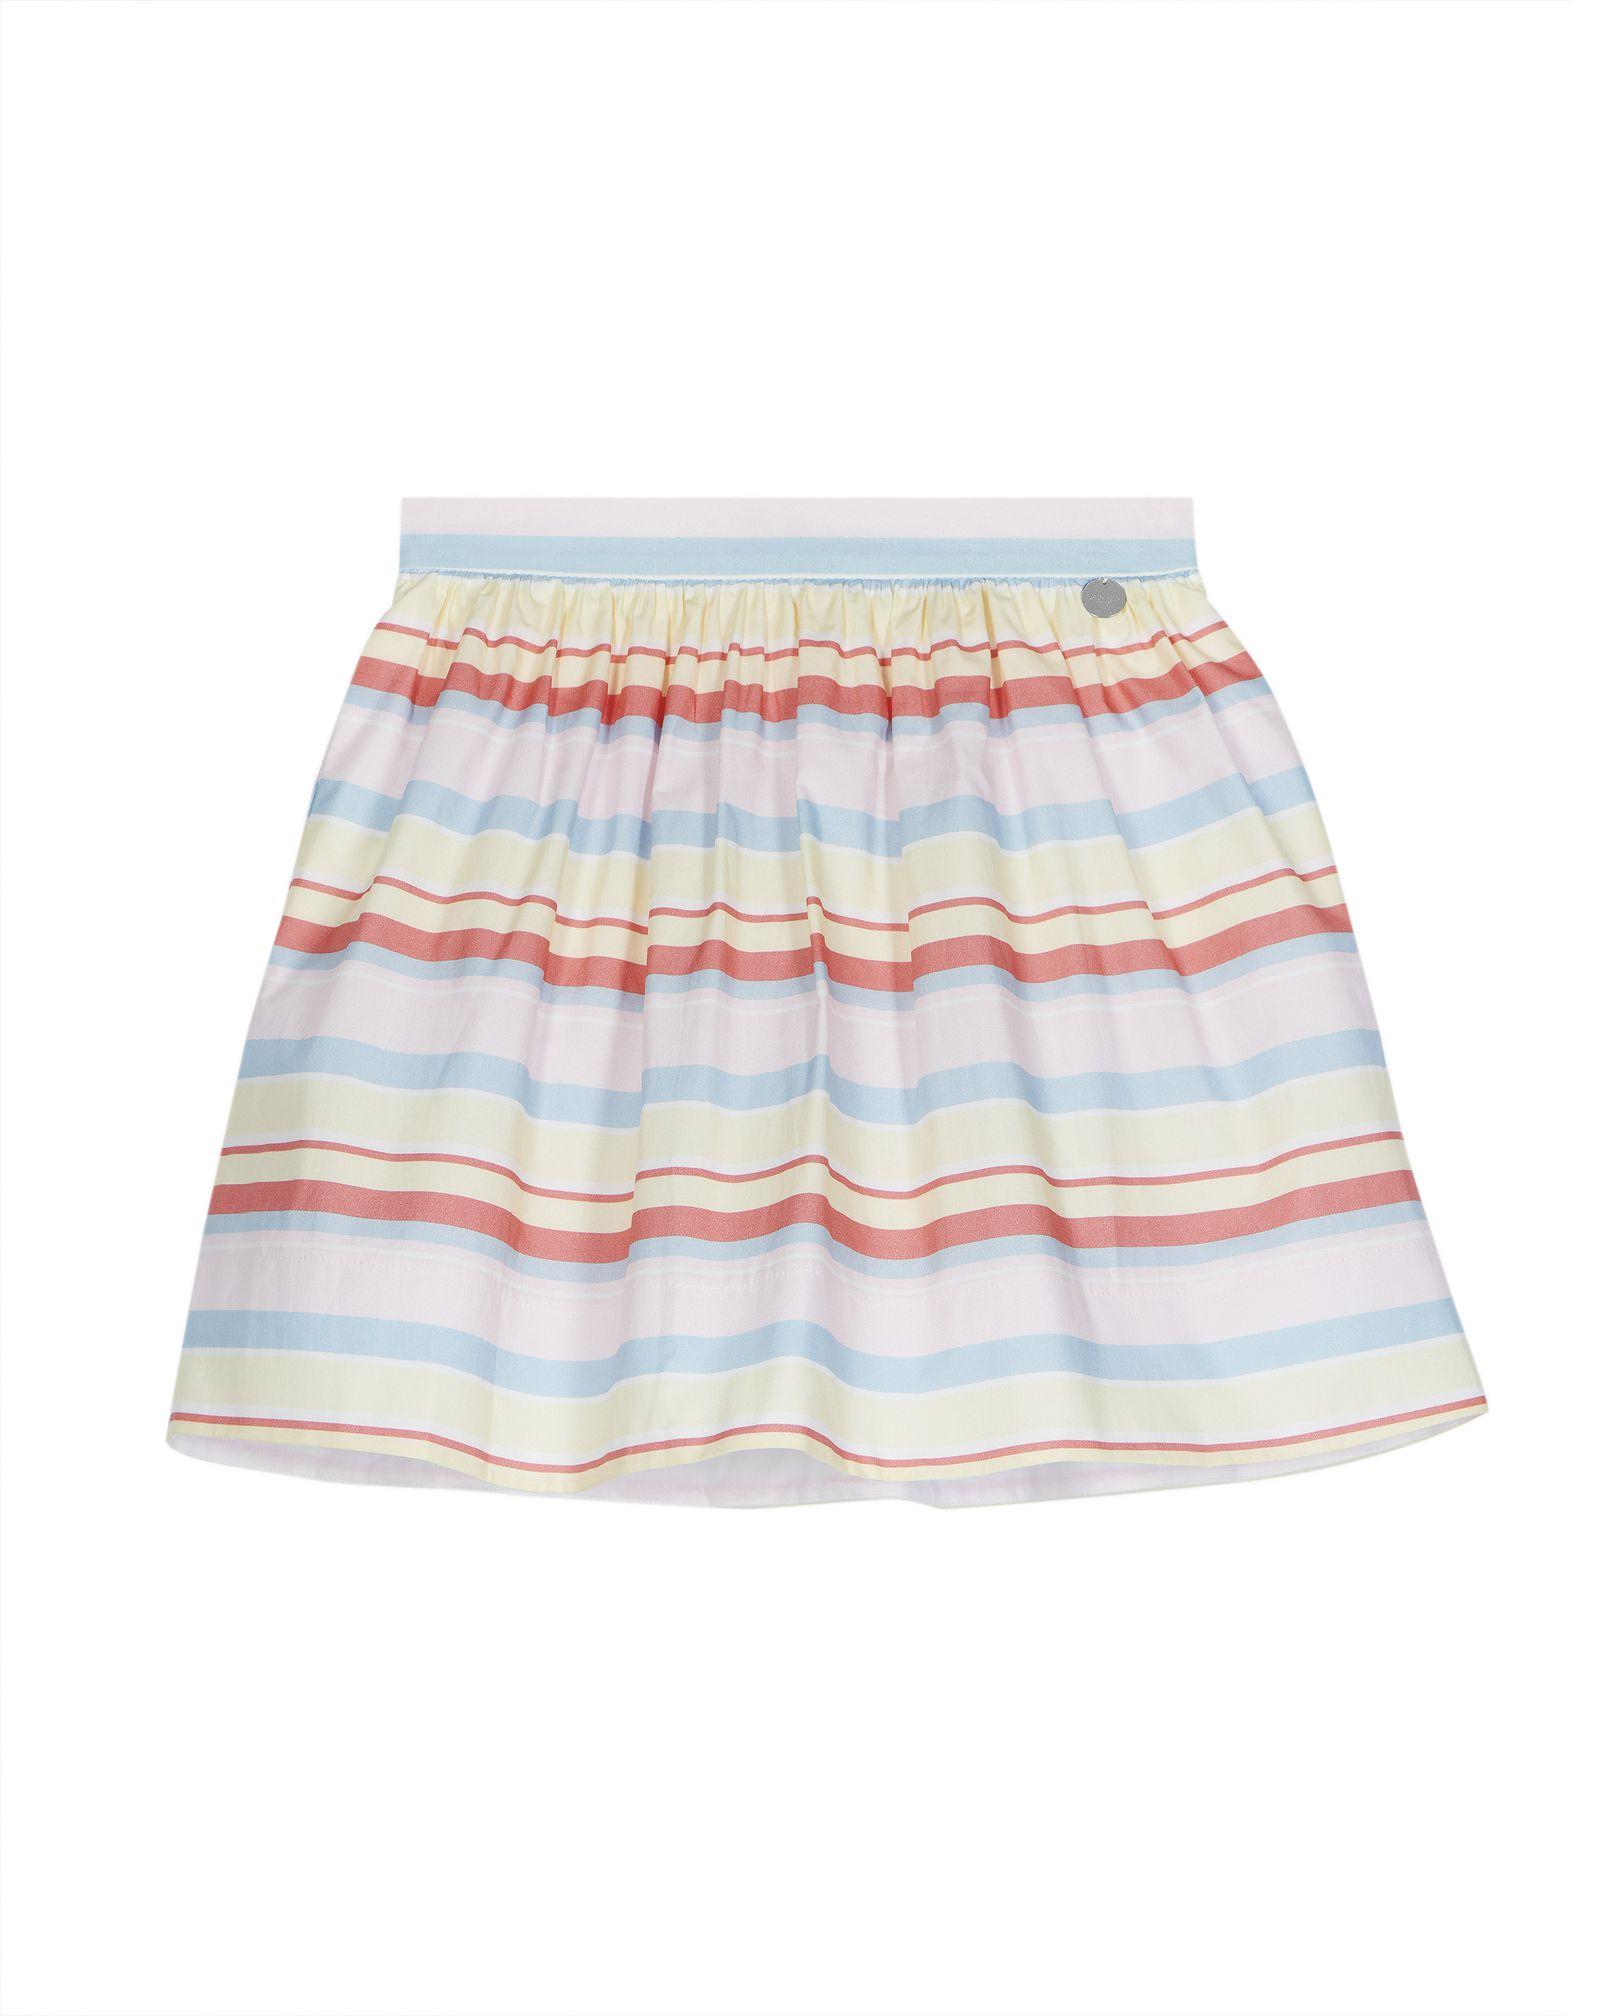 sale retailer c144c c402e GONNA A RIGHE Lanvin, Skirt Childrenswear Donna | Lanvin ...